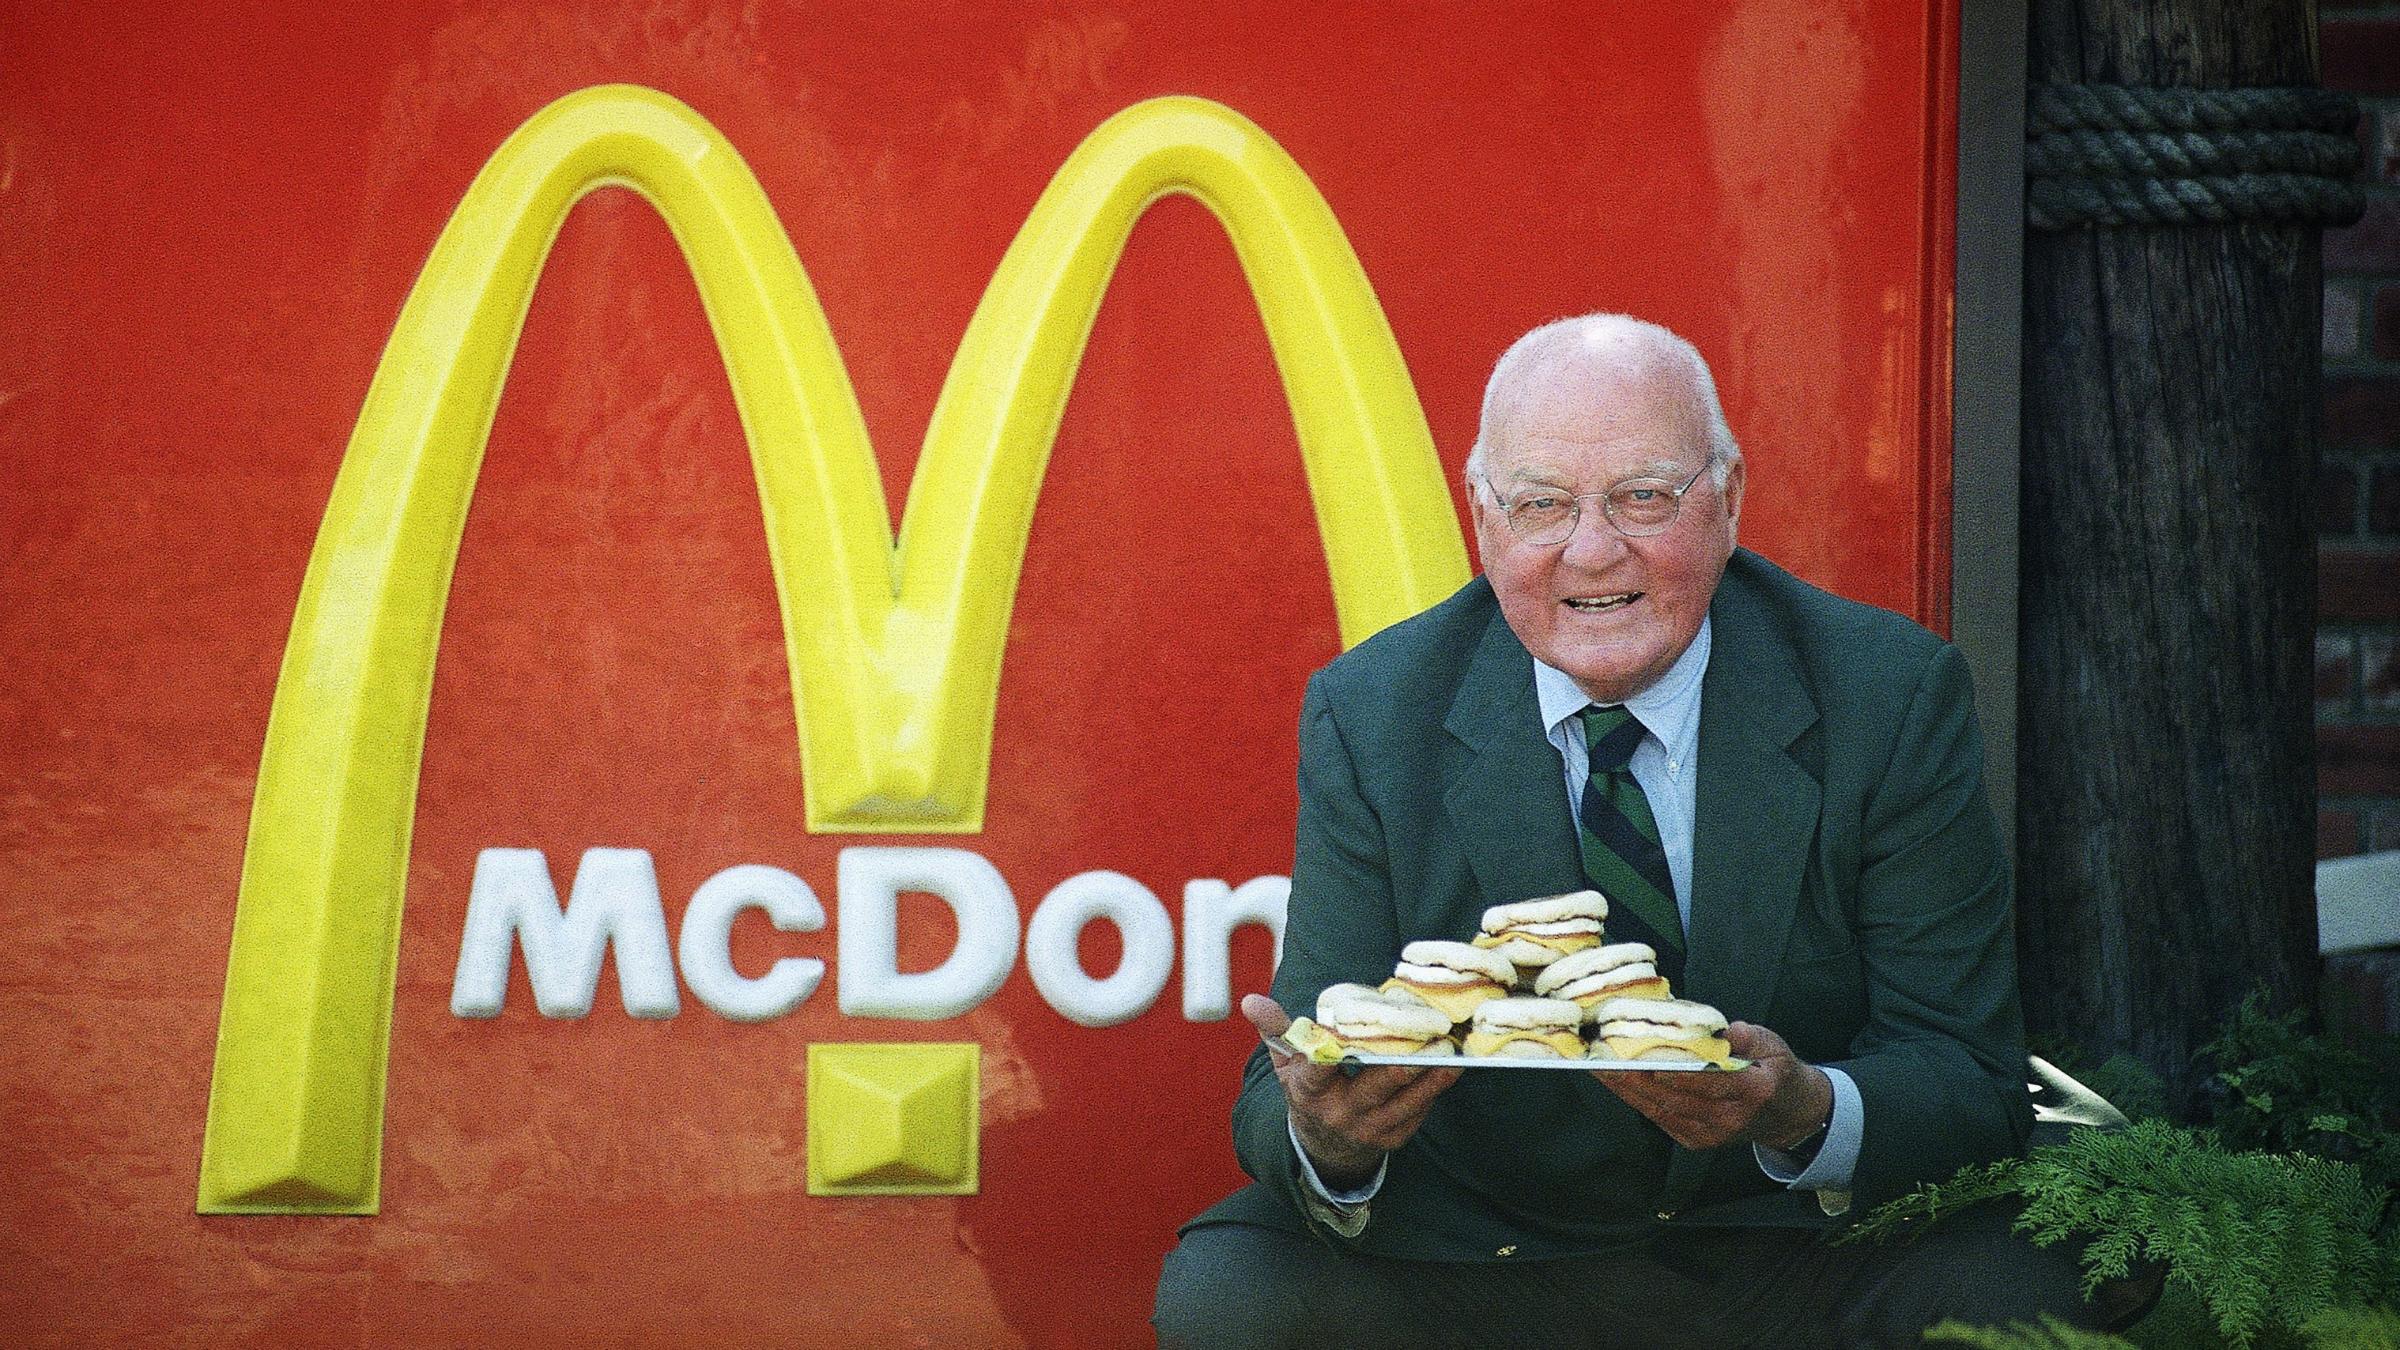 McDonald's Egg McMuffins.jpg